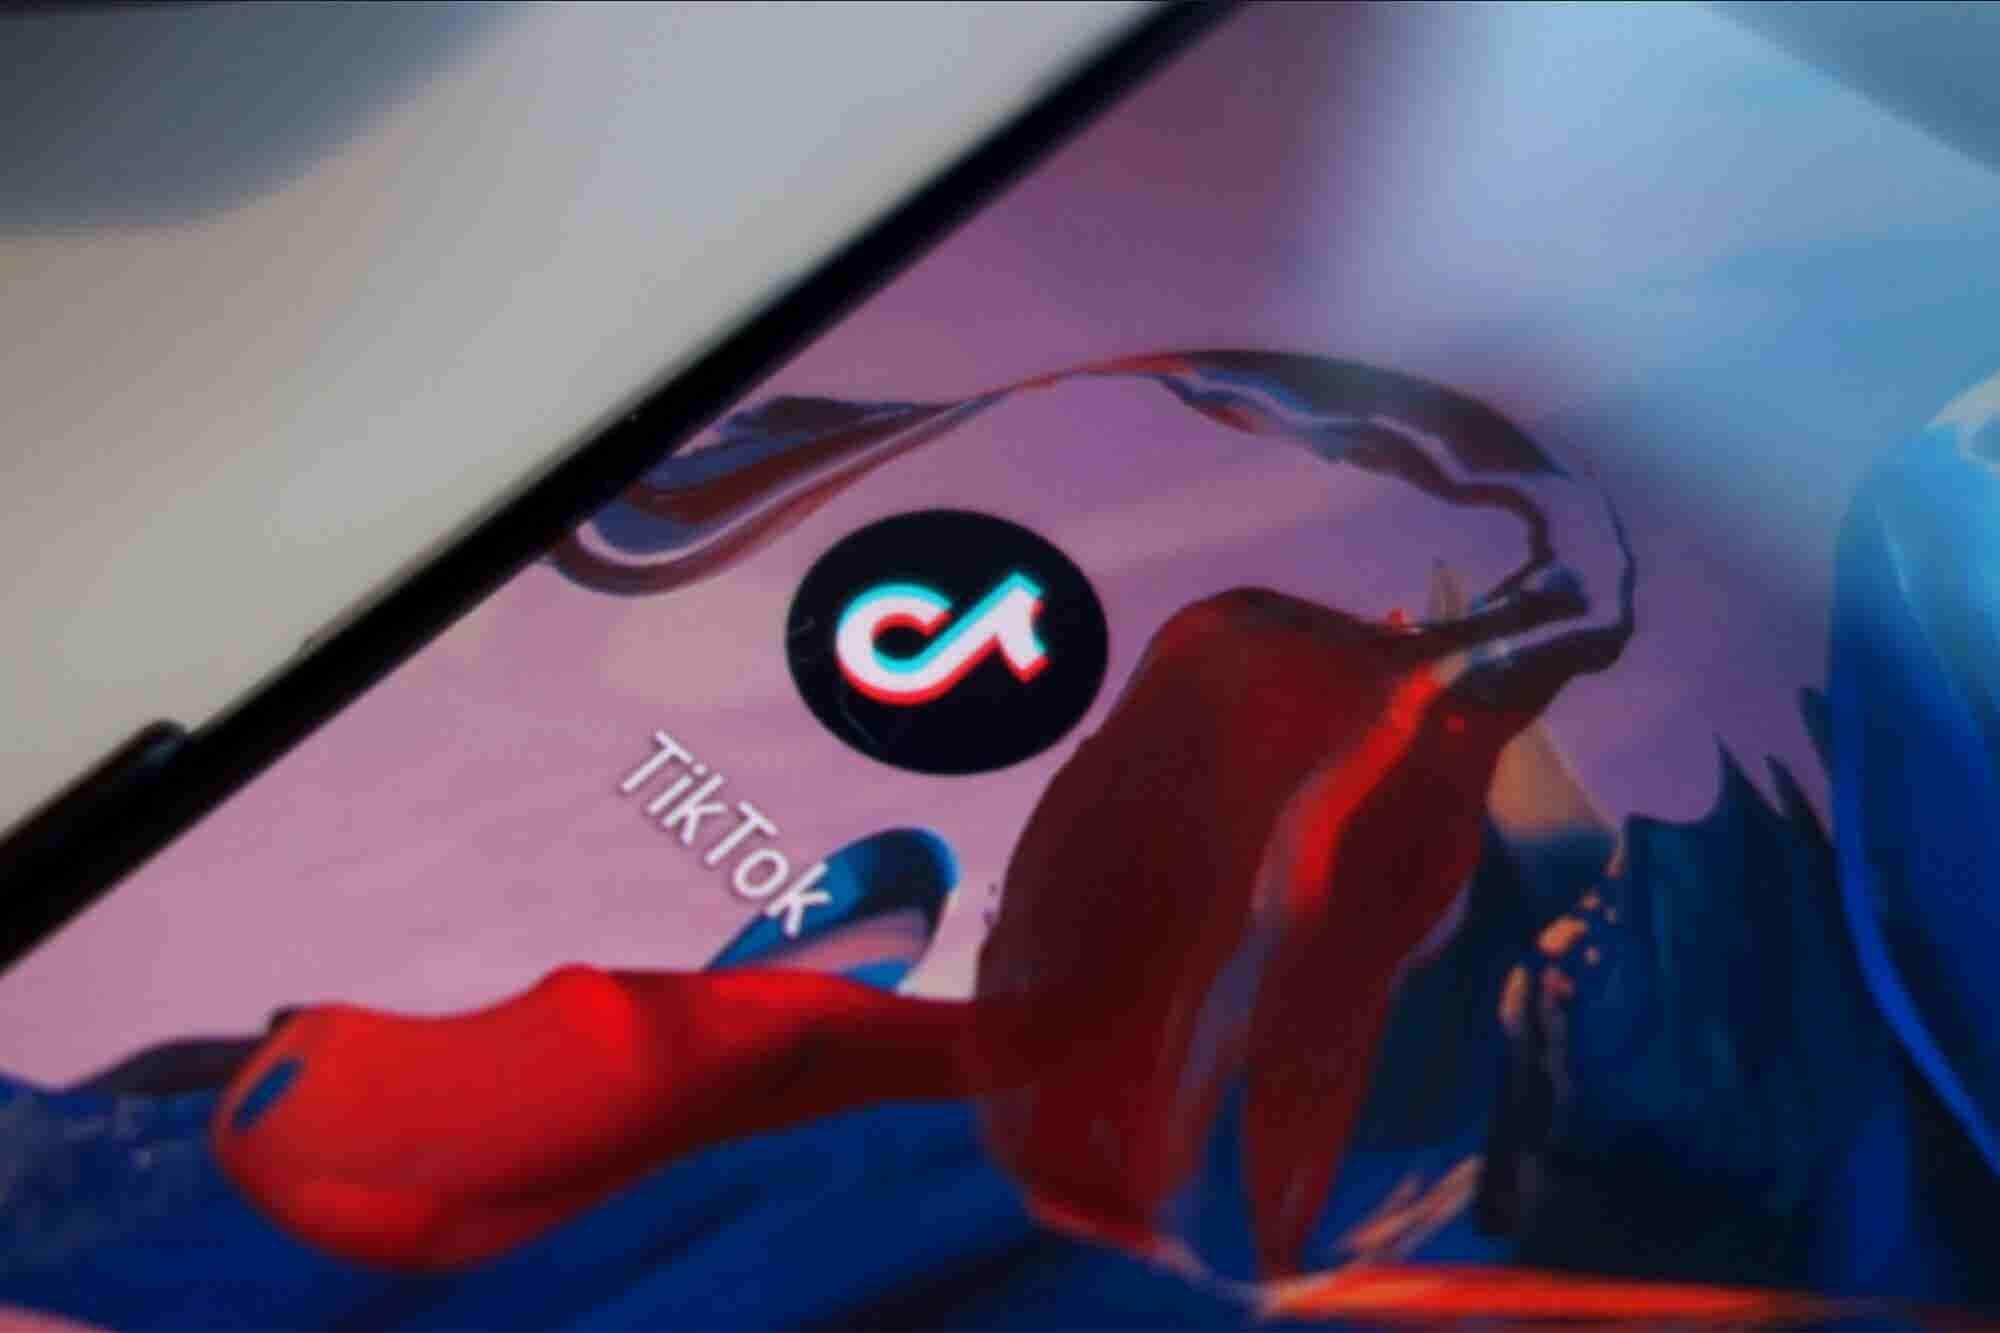 TikTok to Pay $5.7 Million Fine For Violating Children's Privacy Law